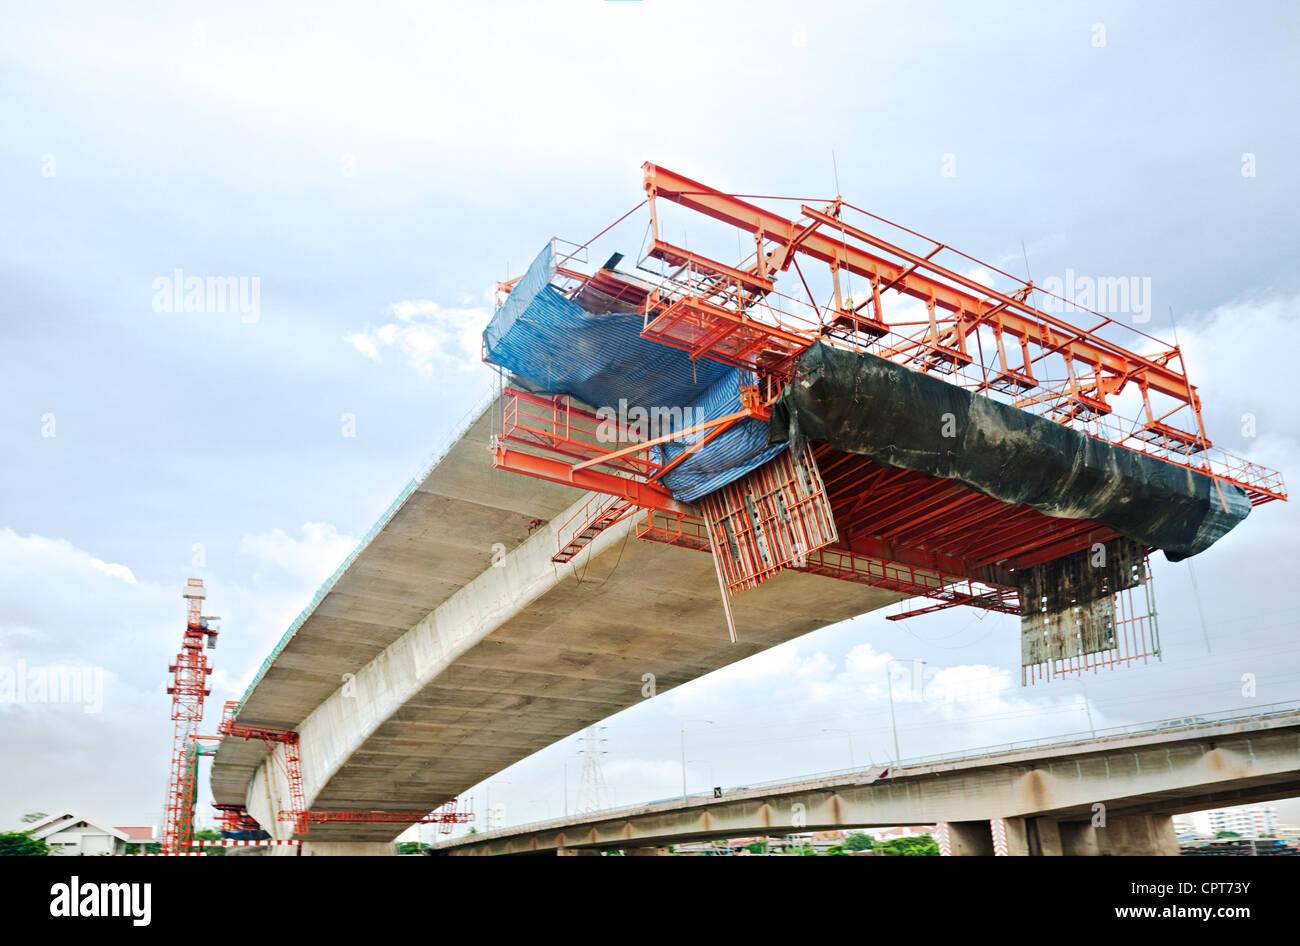 Bridge under construction in Bangkok, Thailand, viewed from below. - Stock Image